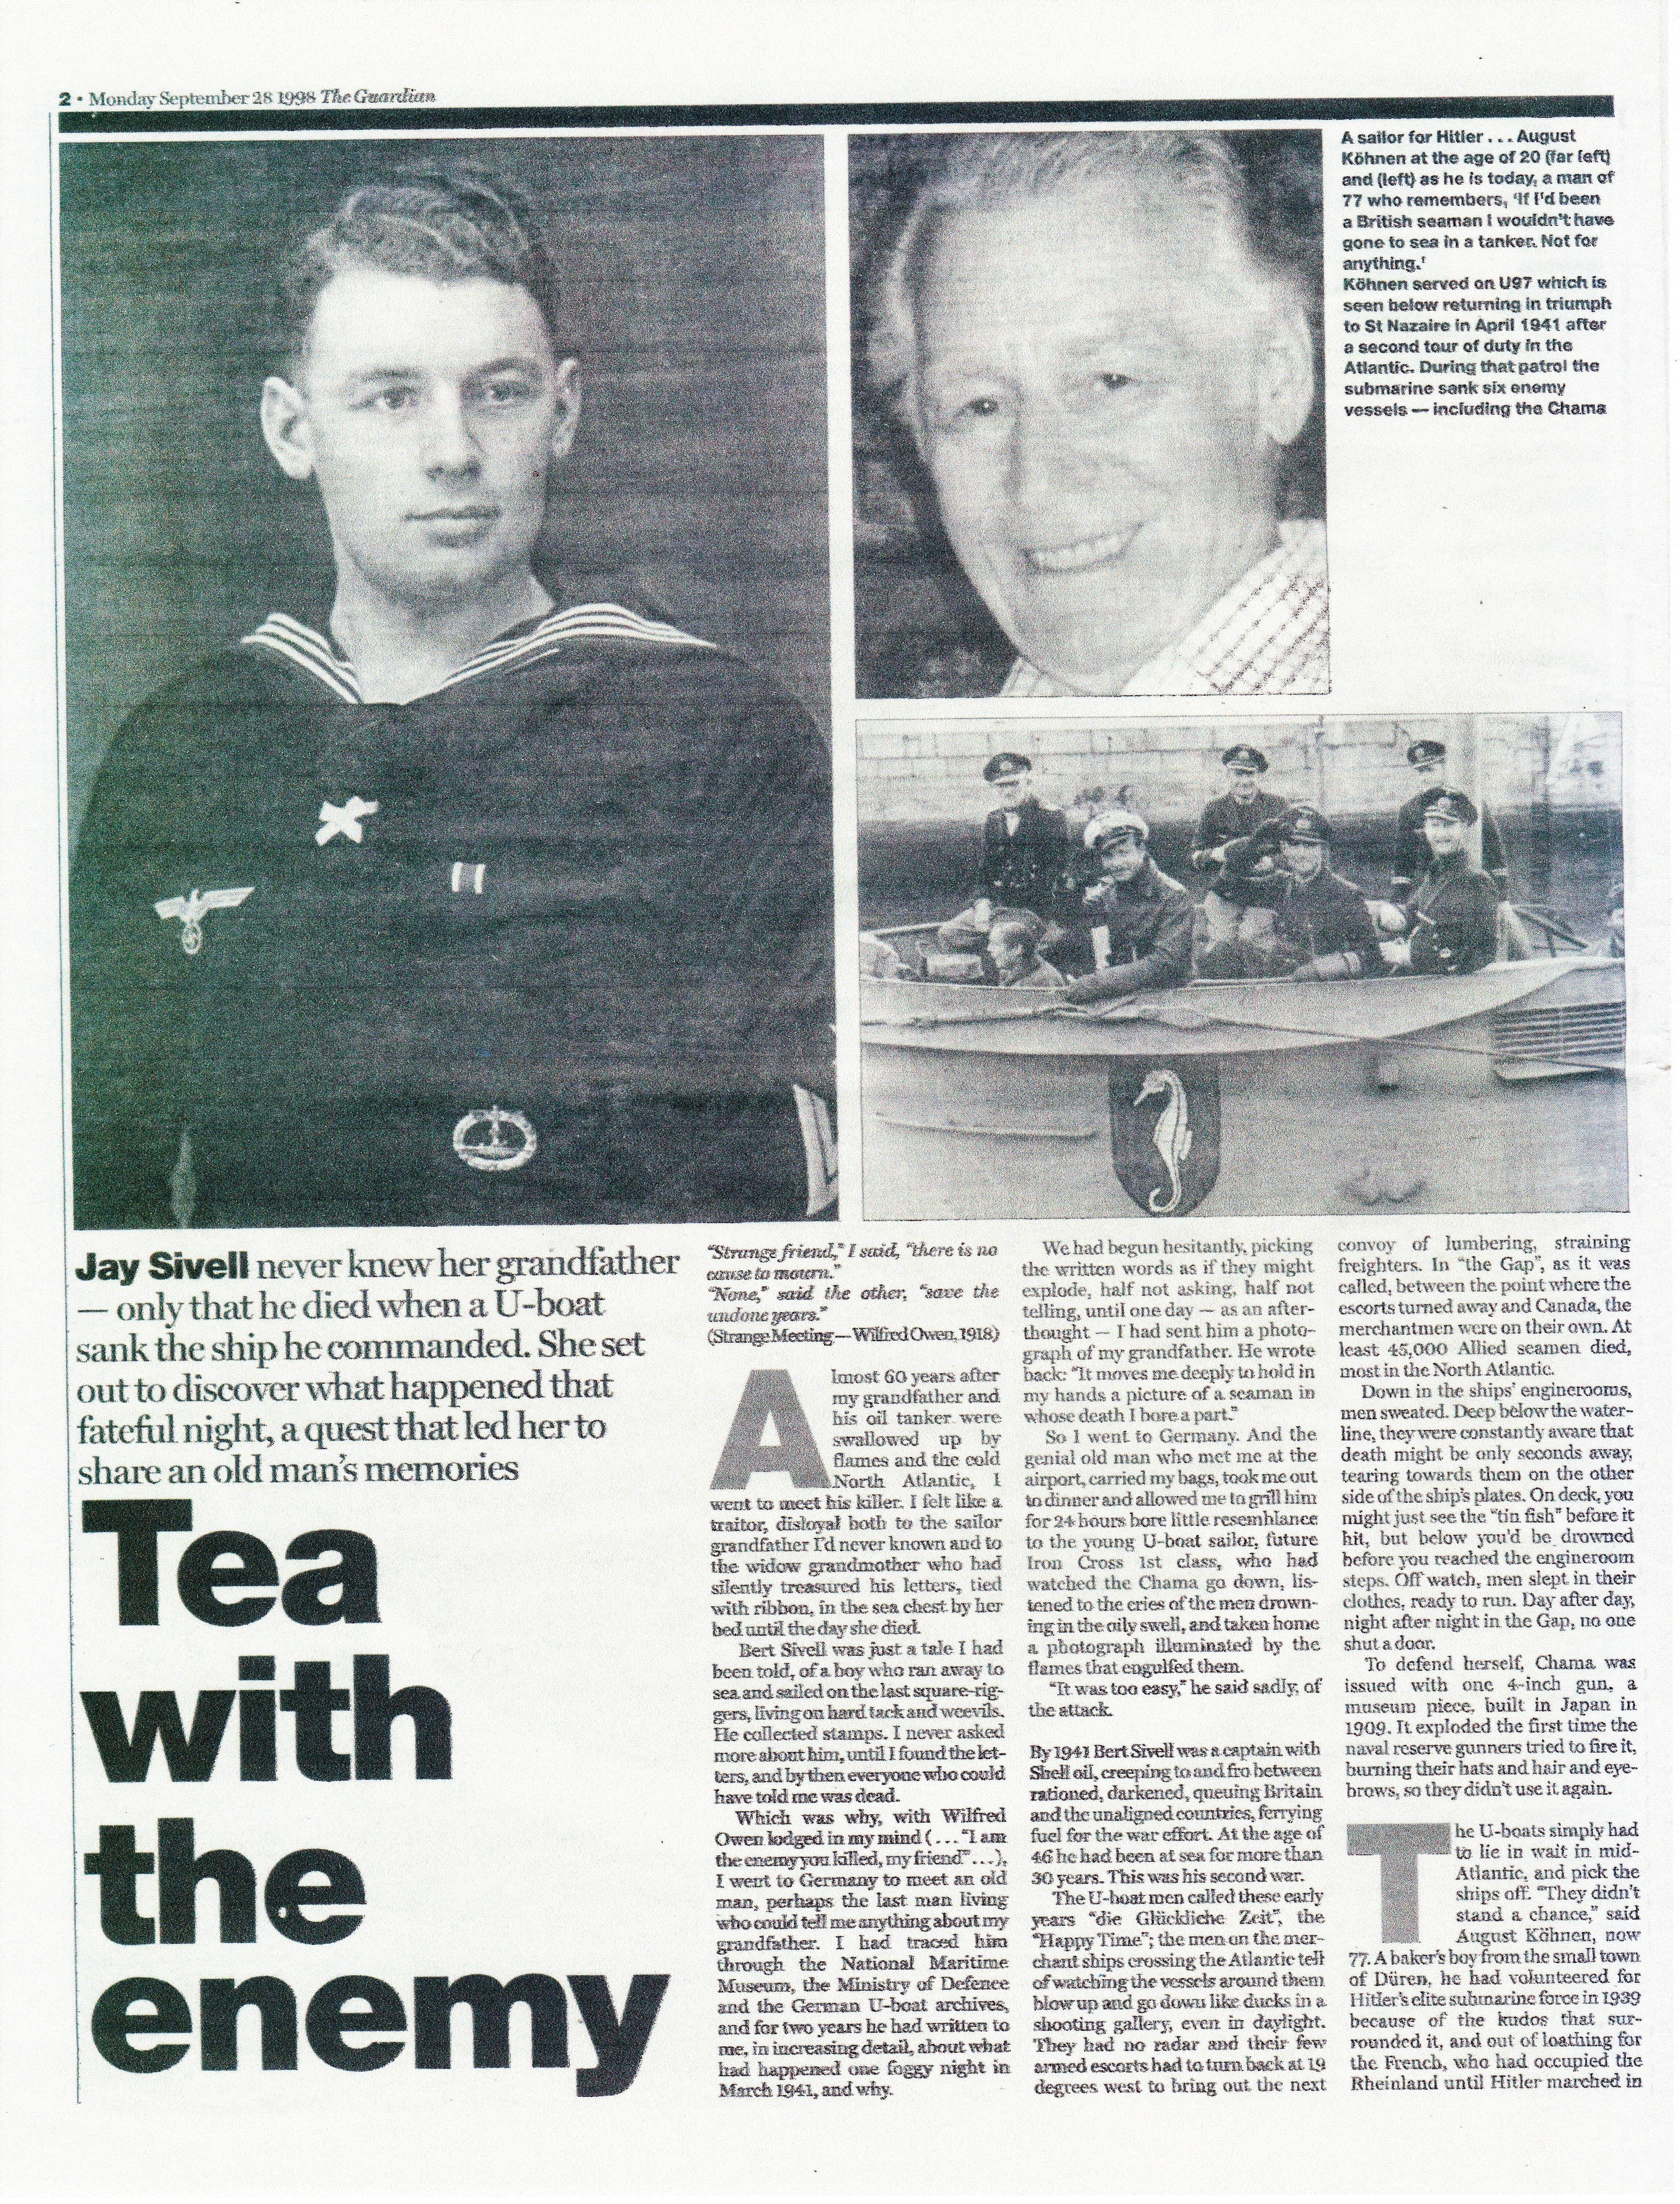 U-boat interview